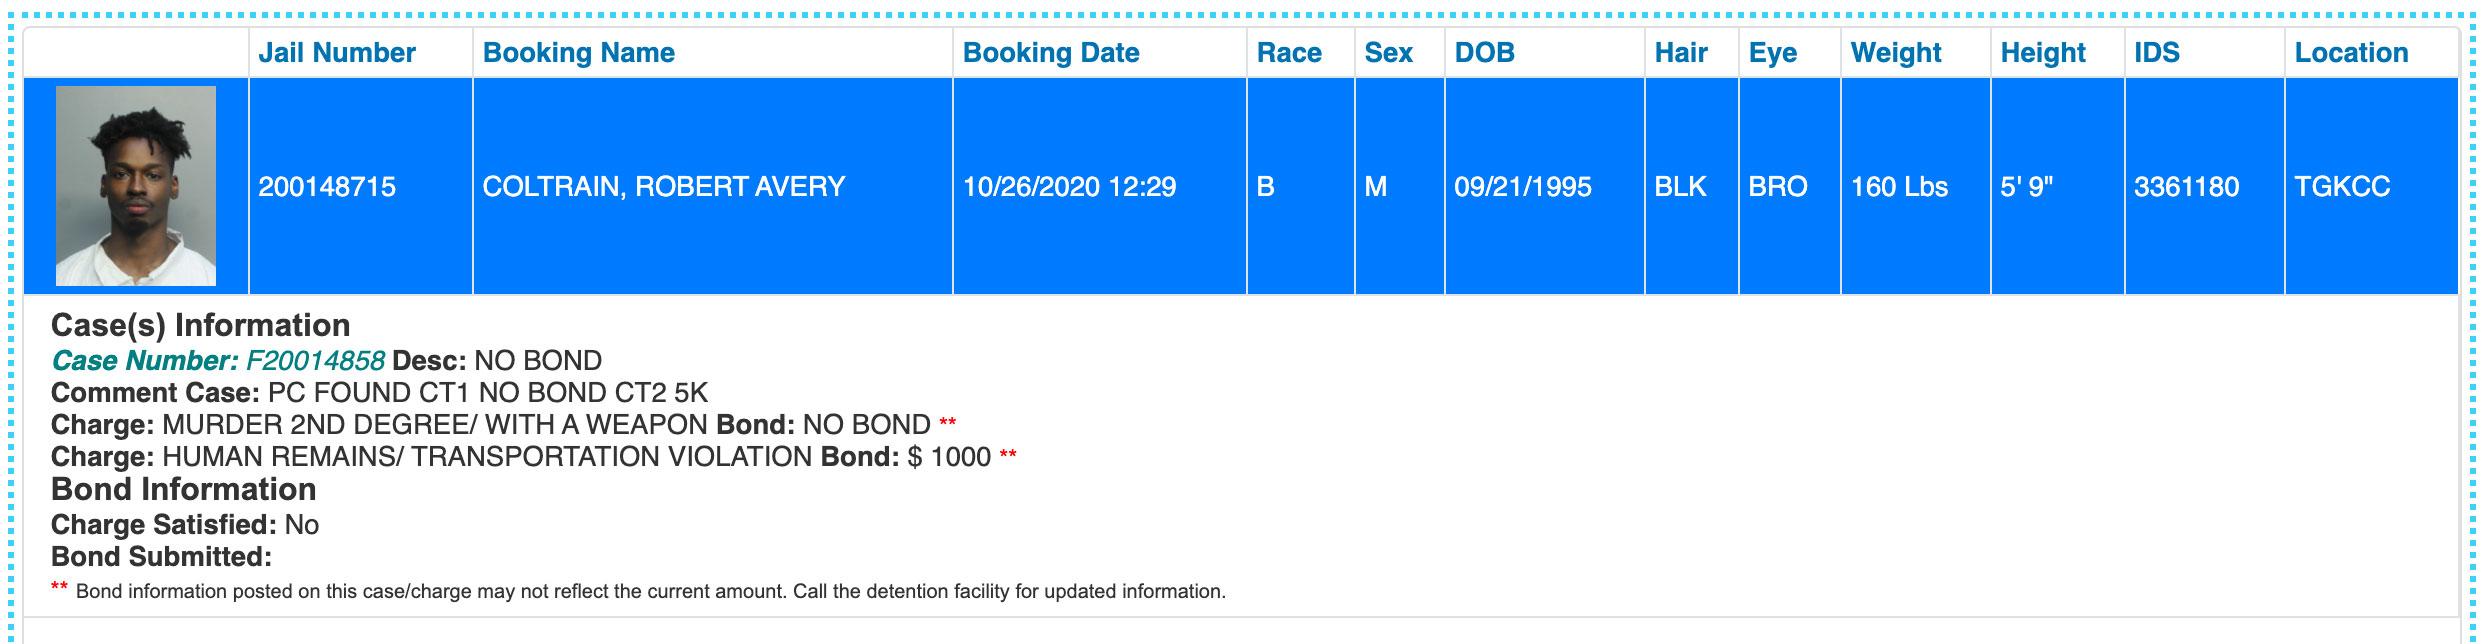 robert-coltrain-booking-miami-dade-jail